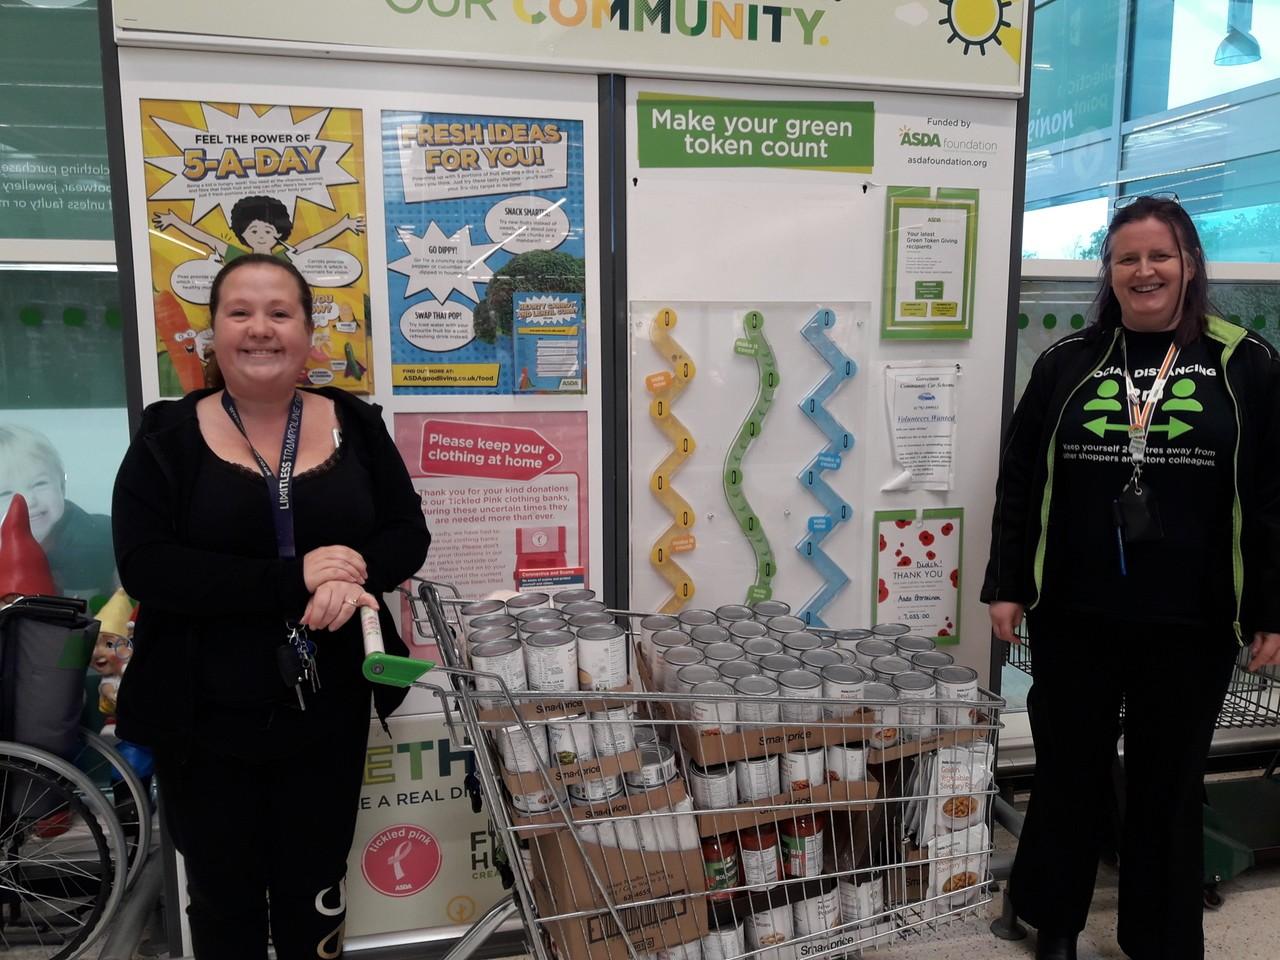 Penlan Community Foodbank donation | Asda Gorseinon